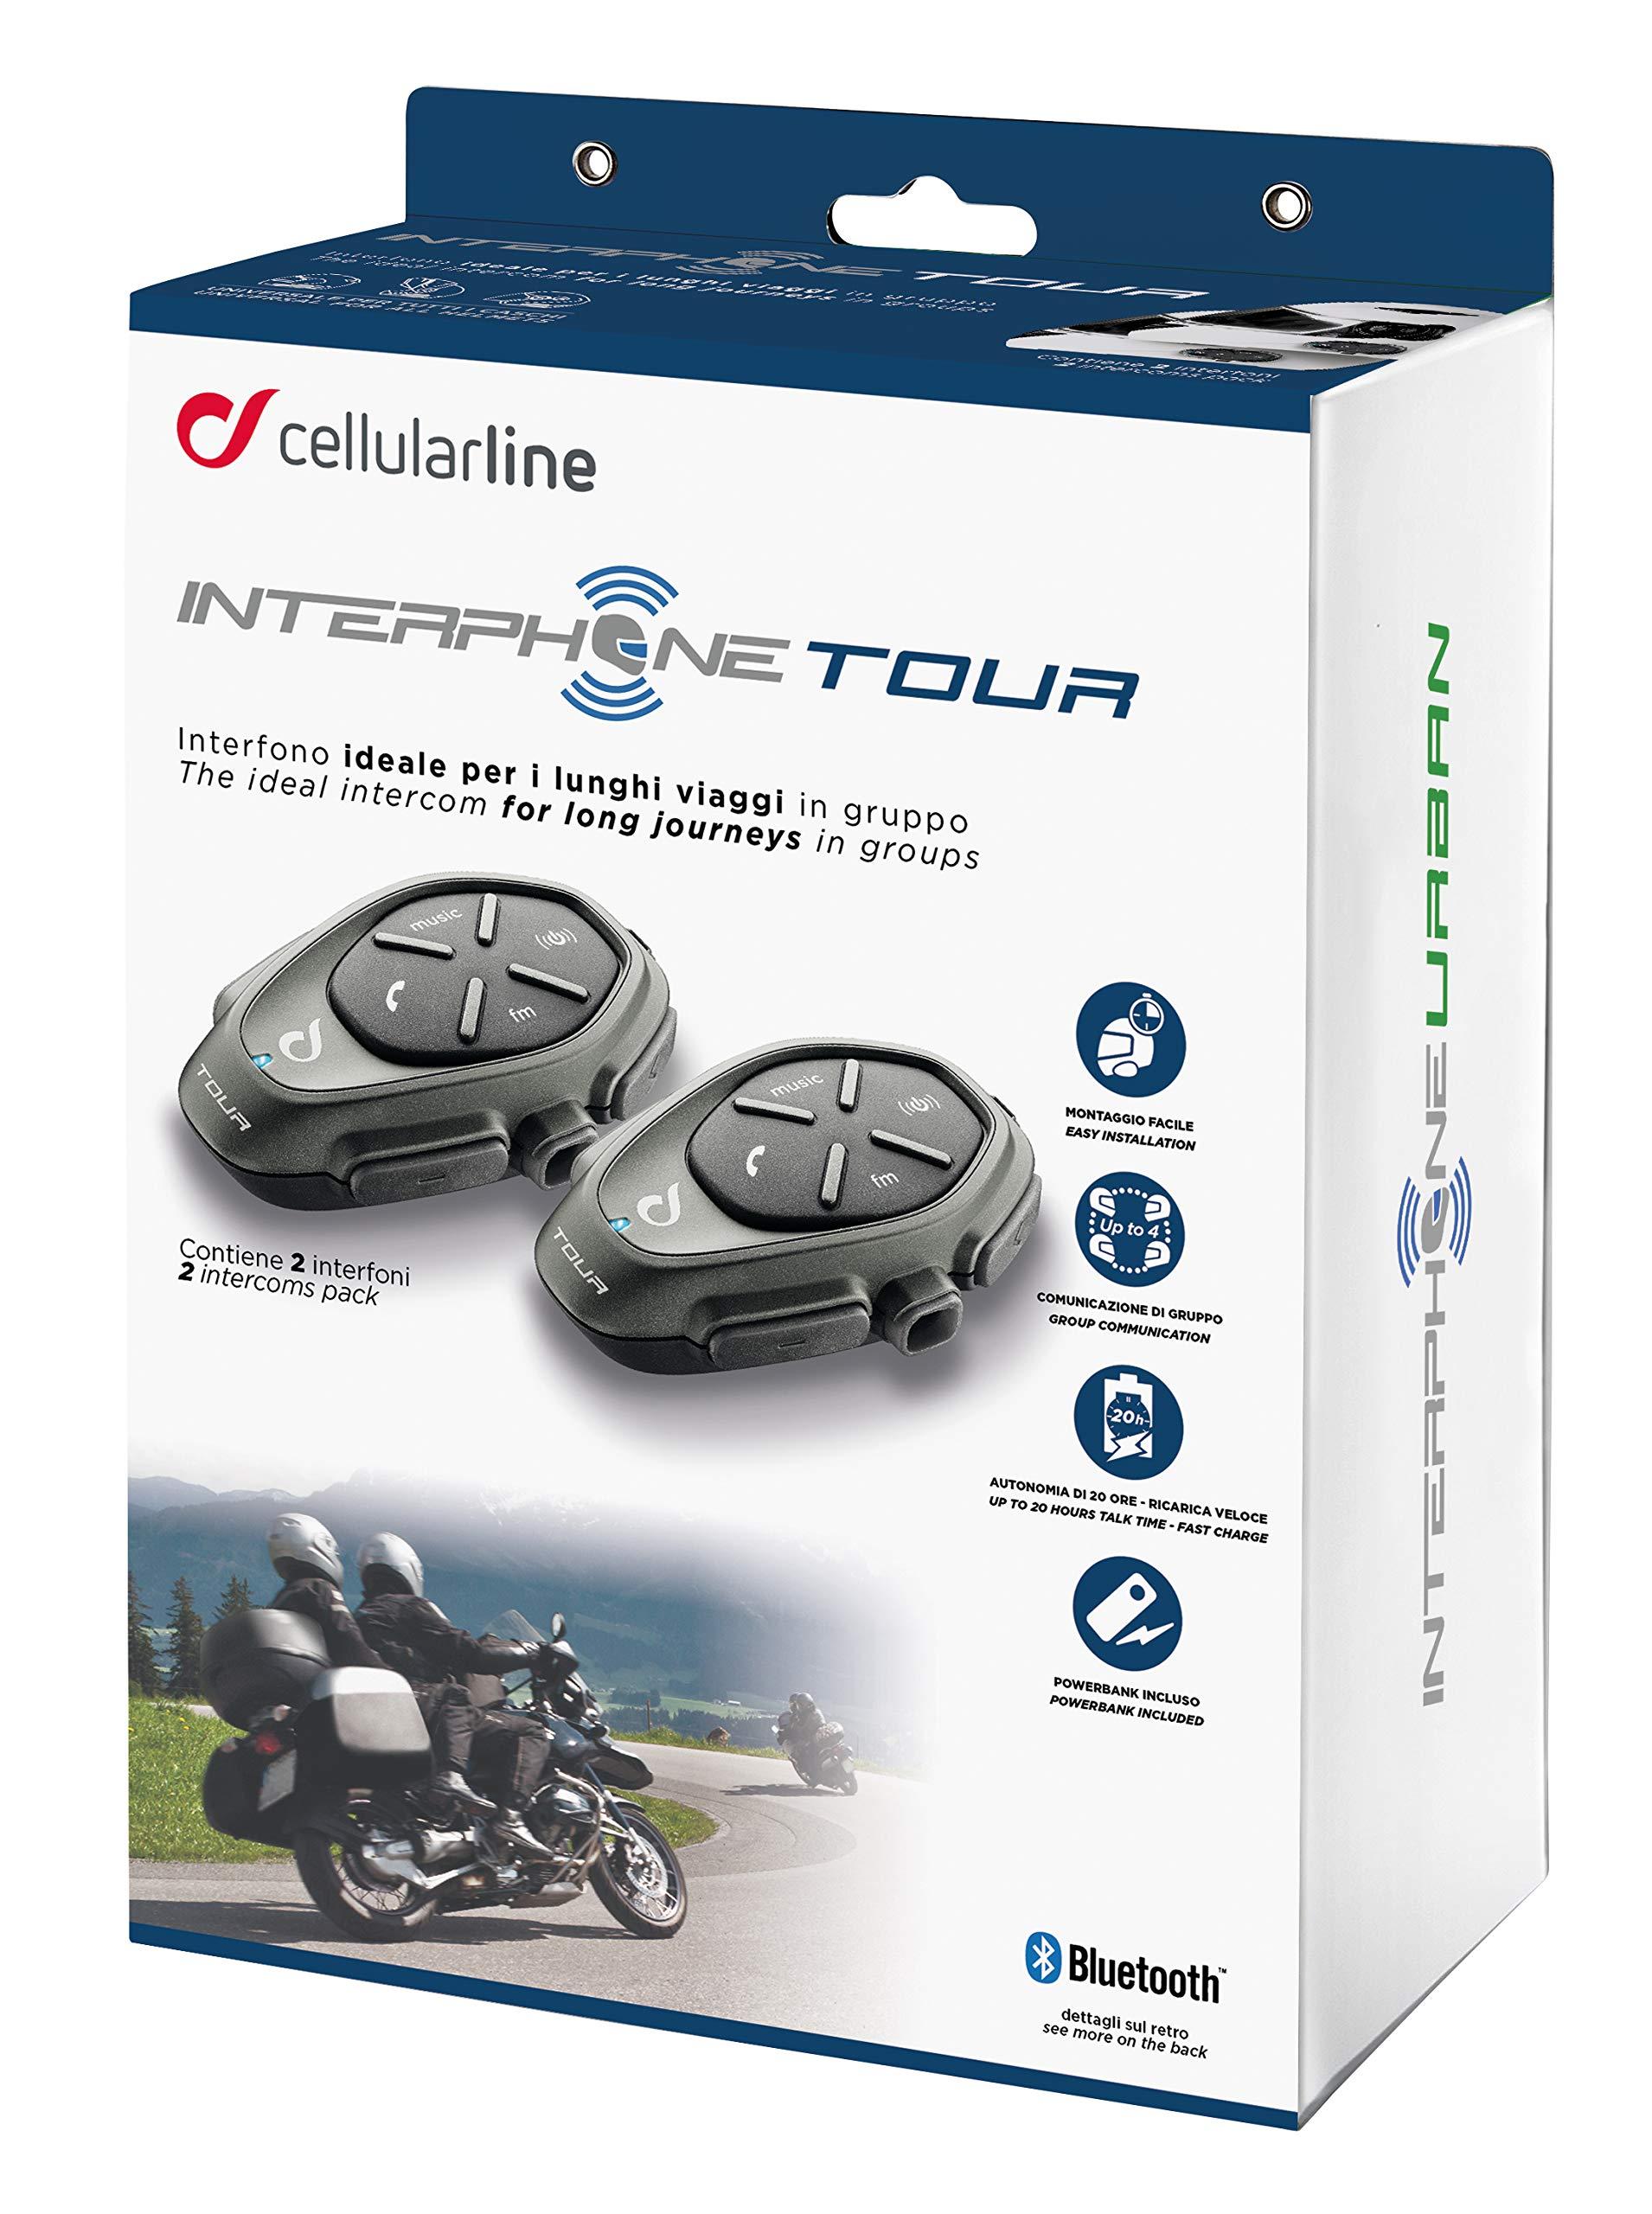 Interphone Tour Intercom Pack (2 pk) by Interphone